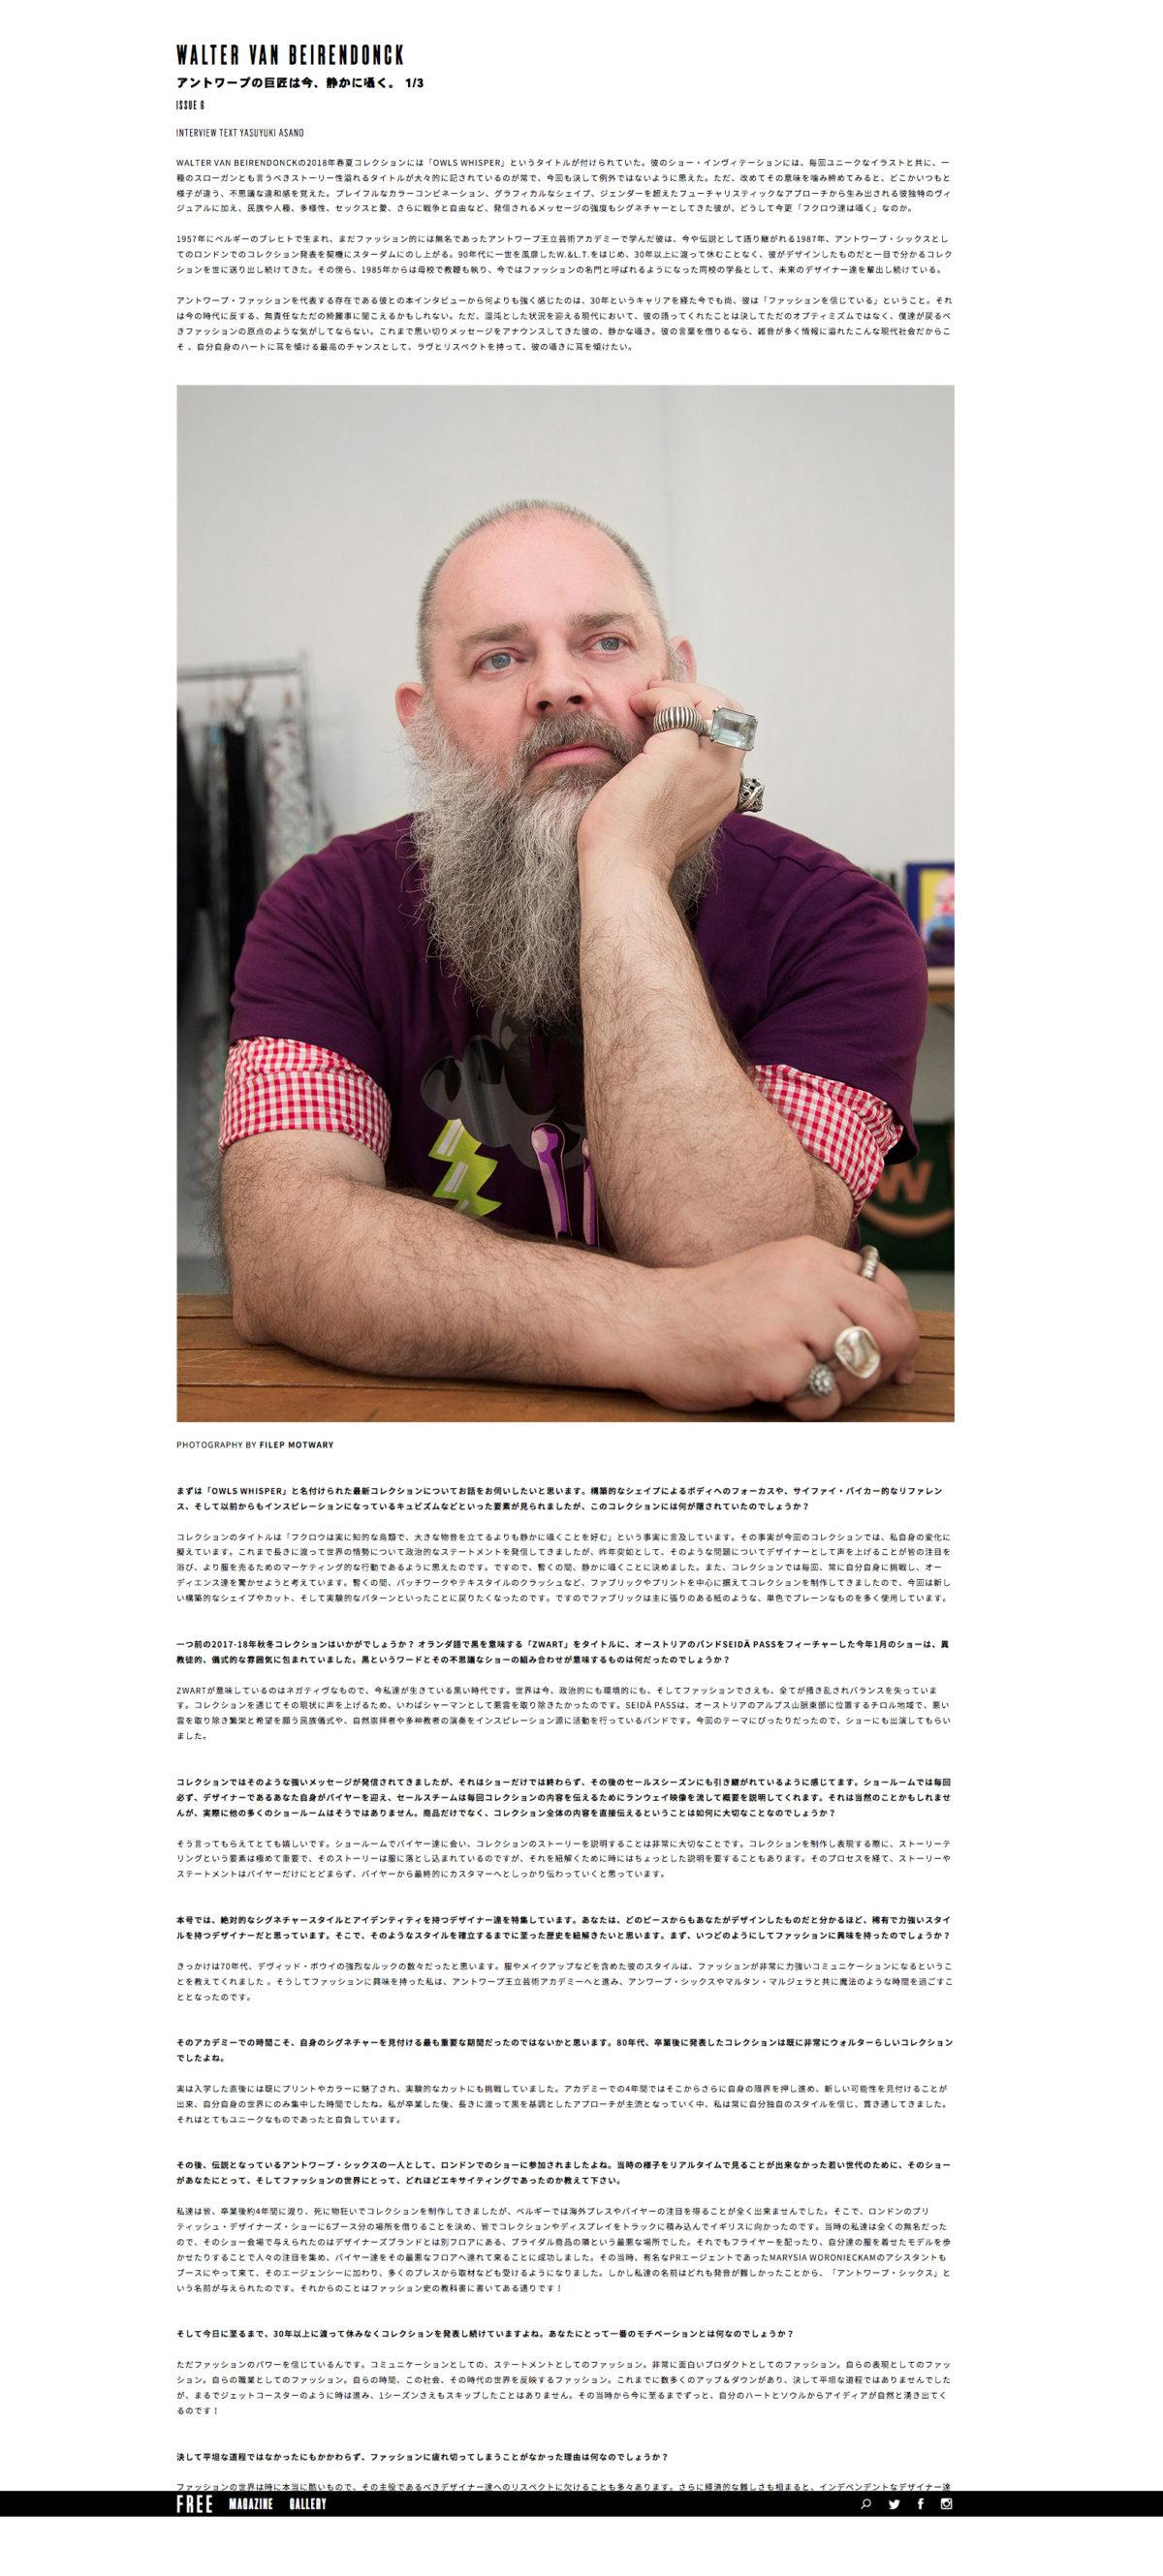 WALTER VAN BEIRENDONCK ウィメンズ&メンズファッション誌『FREE MAGAZINE』Filep Motwary